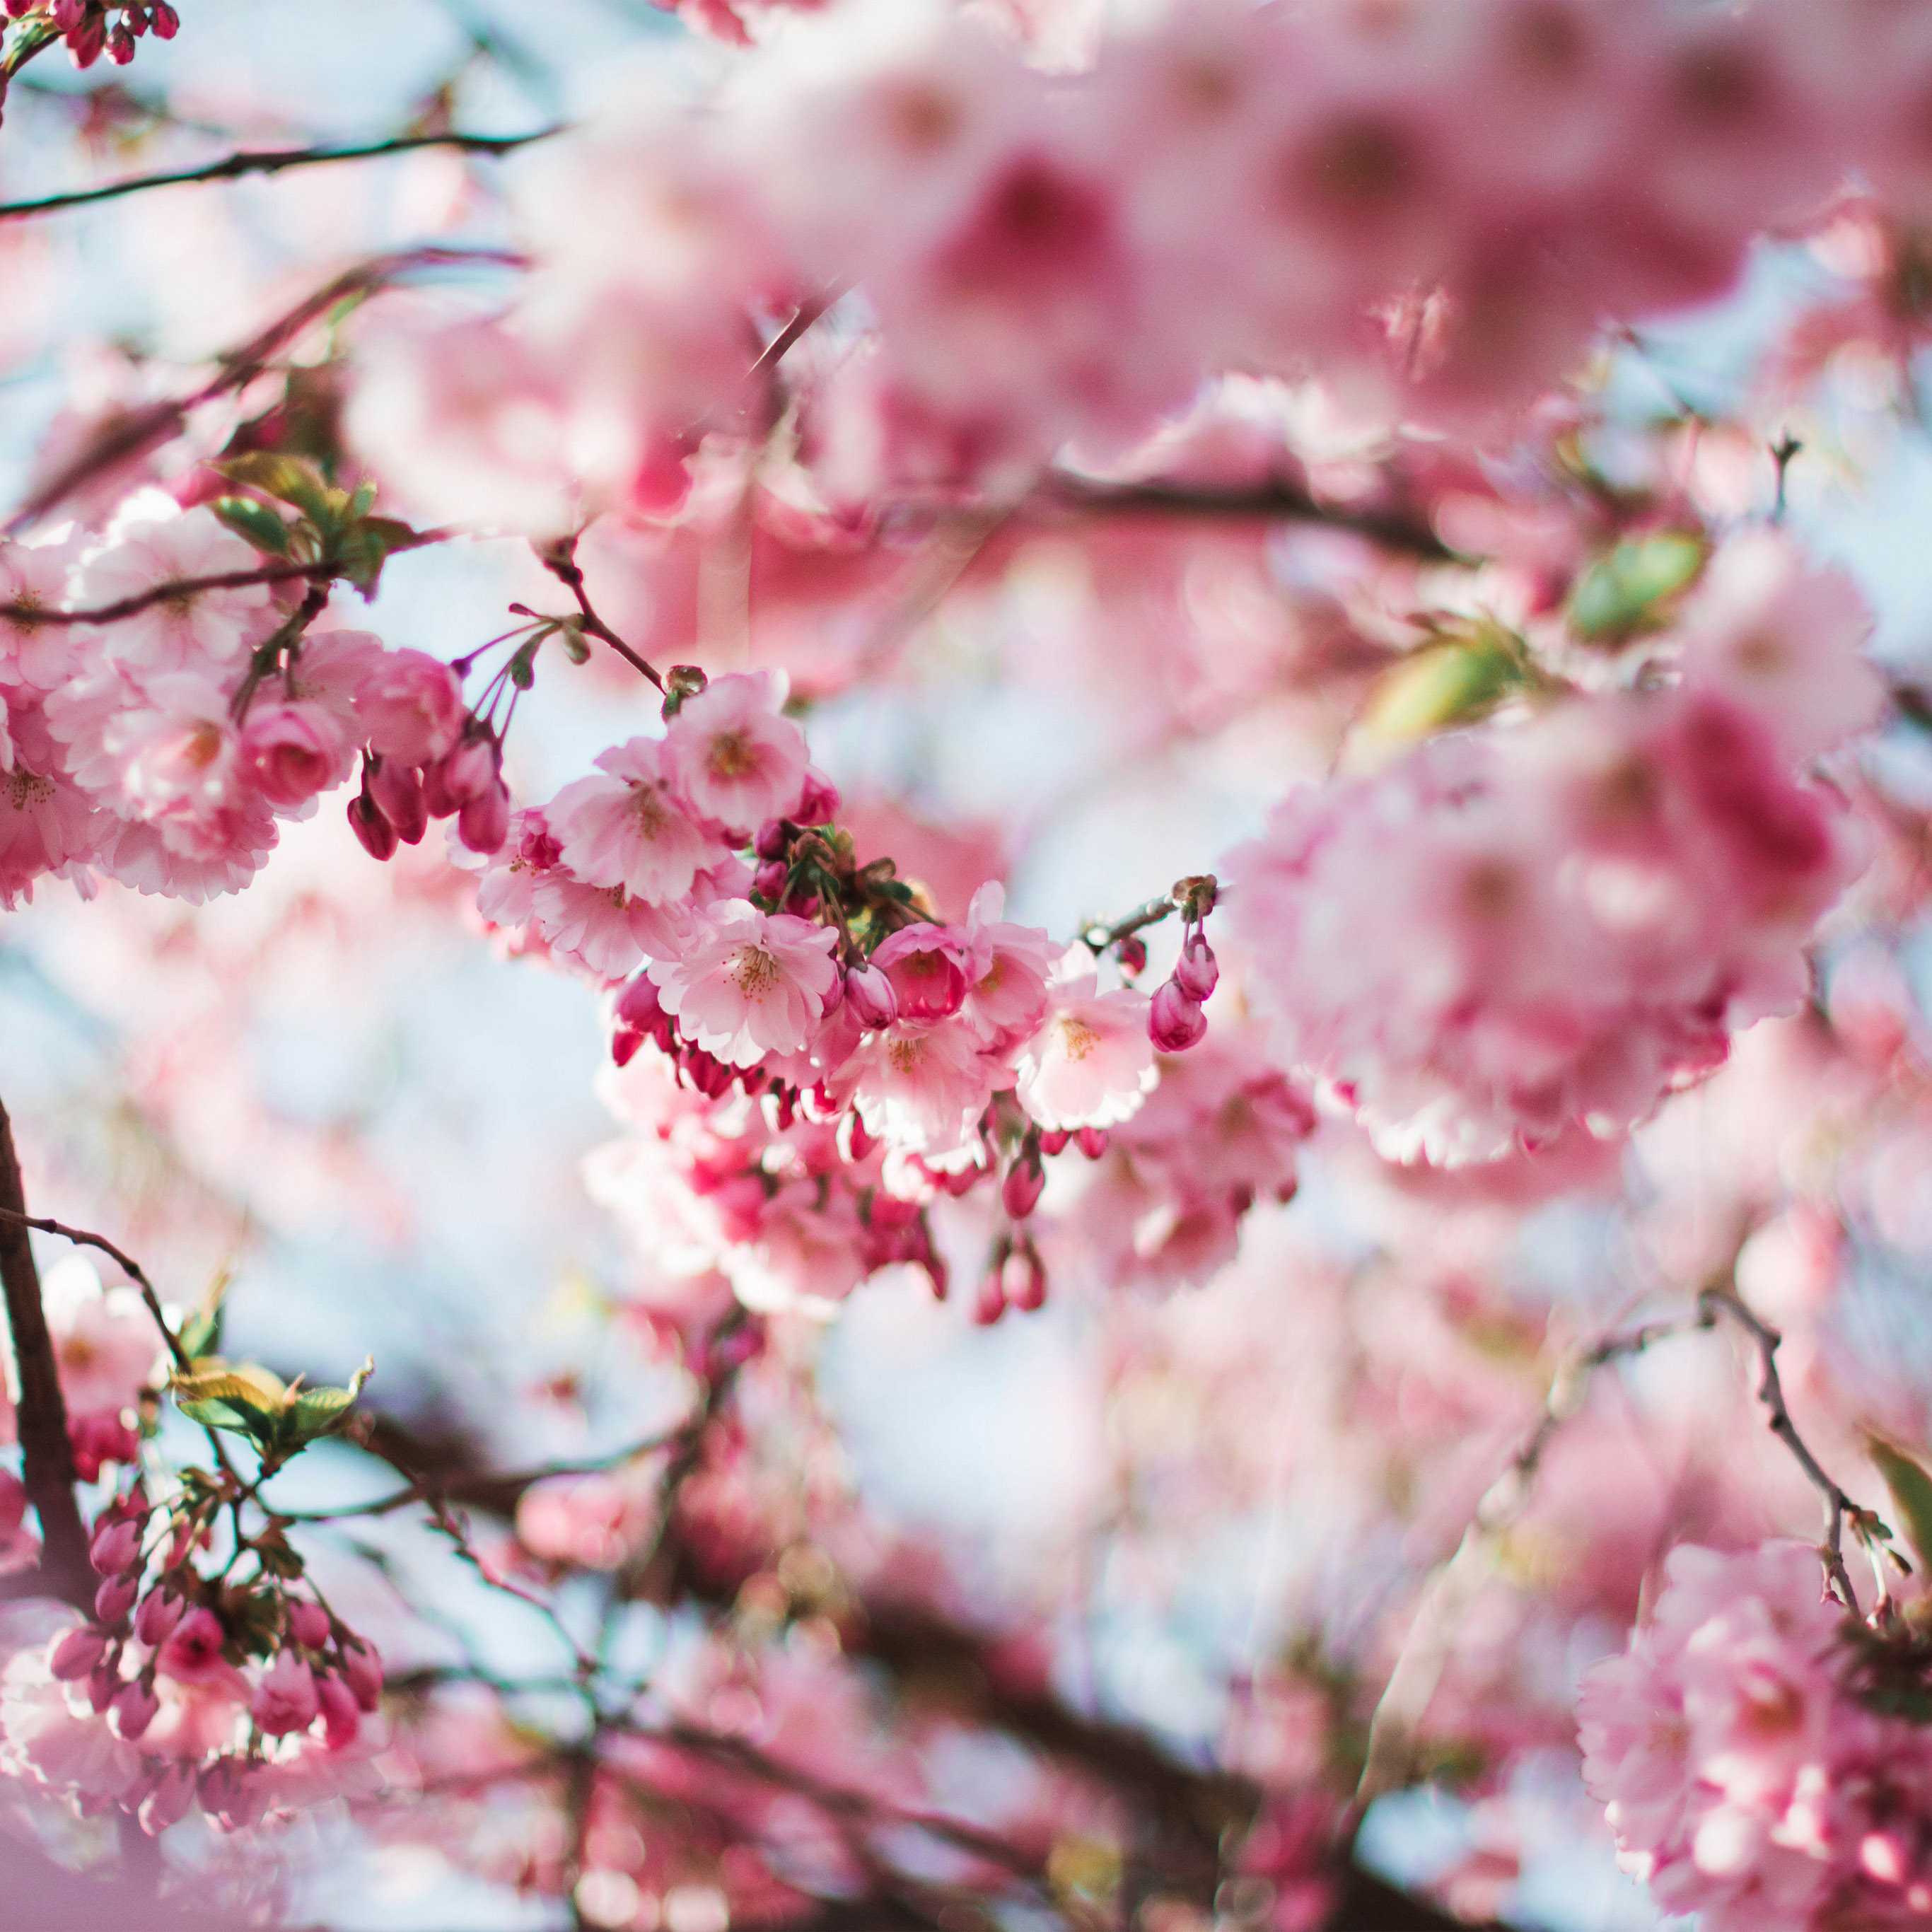 Nx72 Spring Cherry Blossom Tree Flower Pink Nature Wallpaper